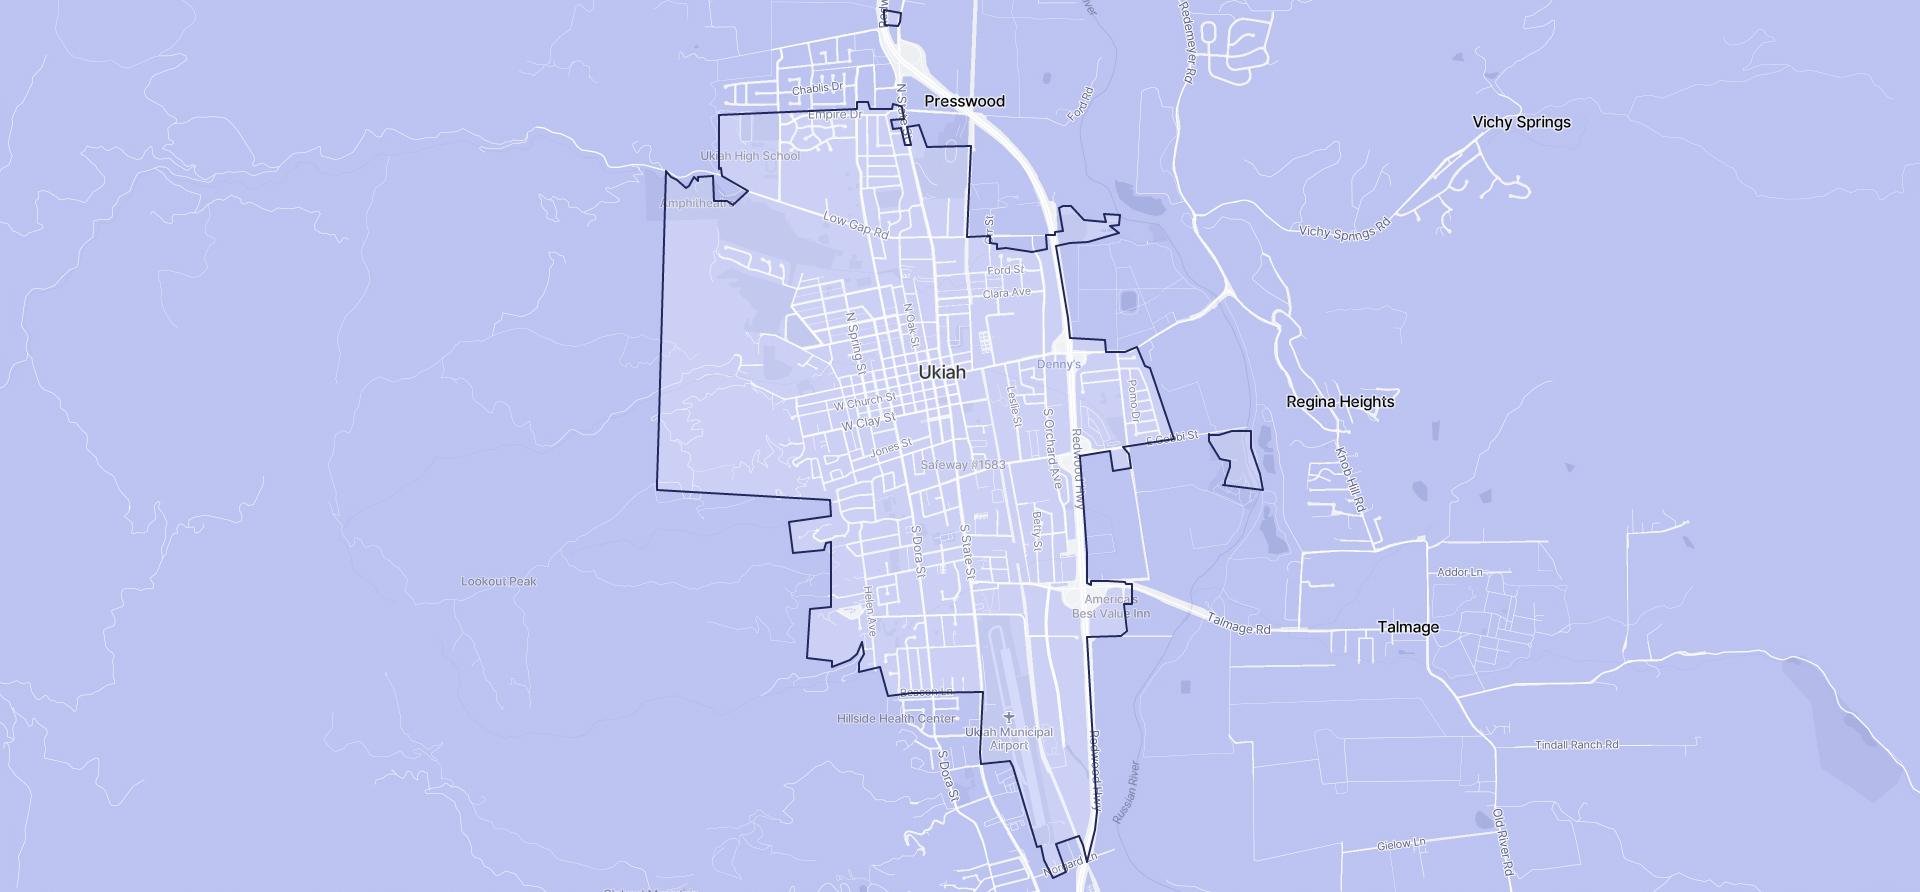 Image of Ukiah boundaries on a map.